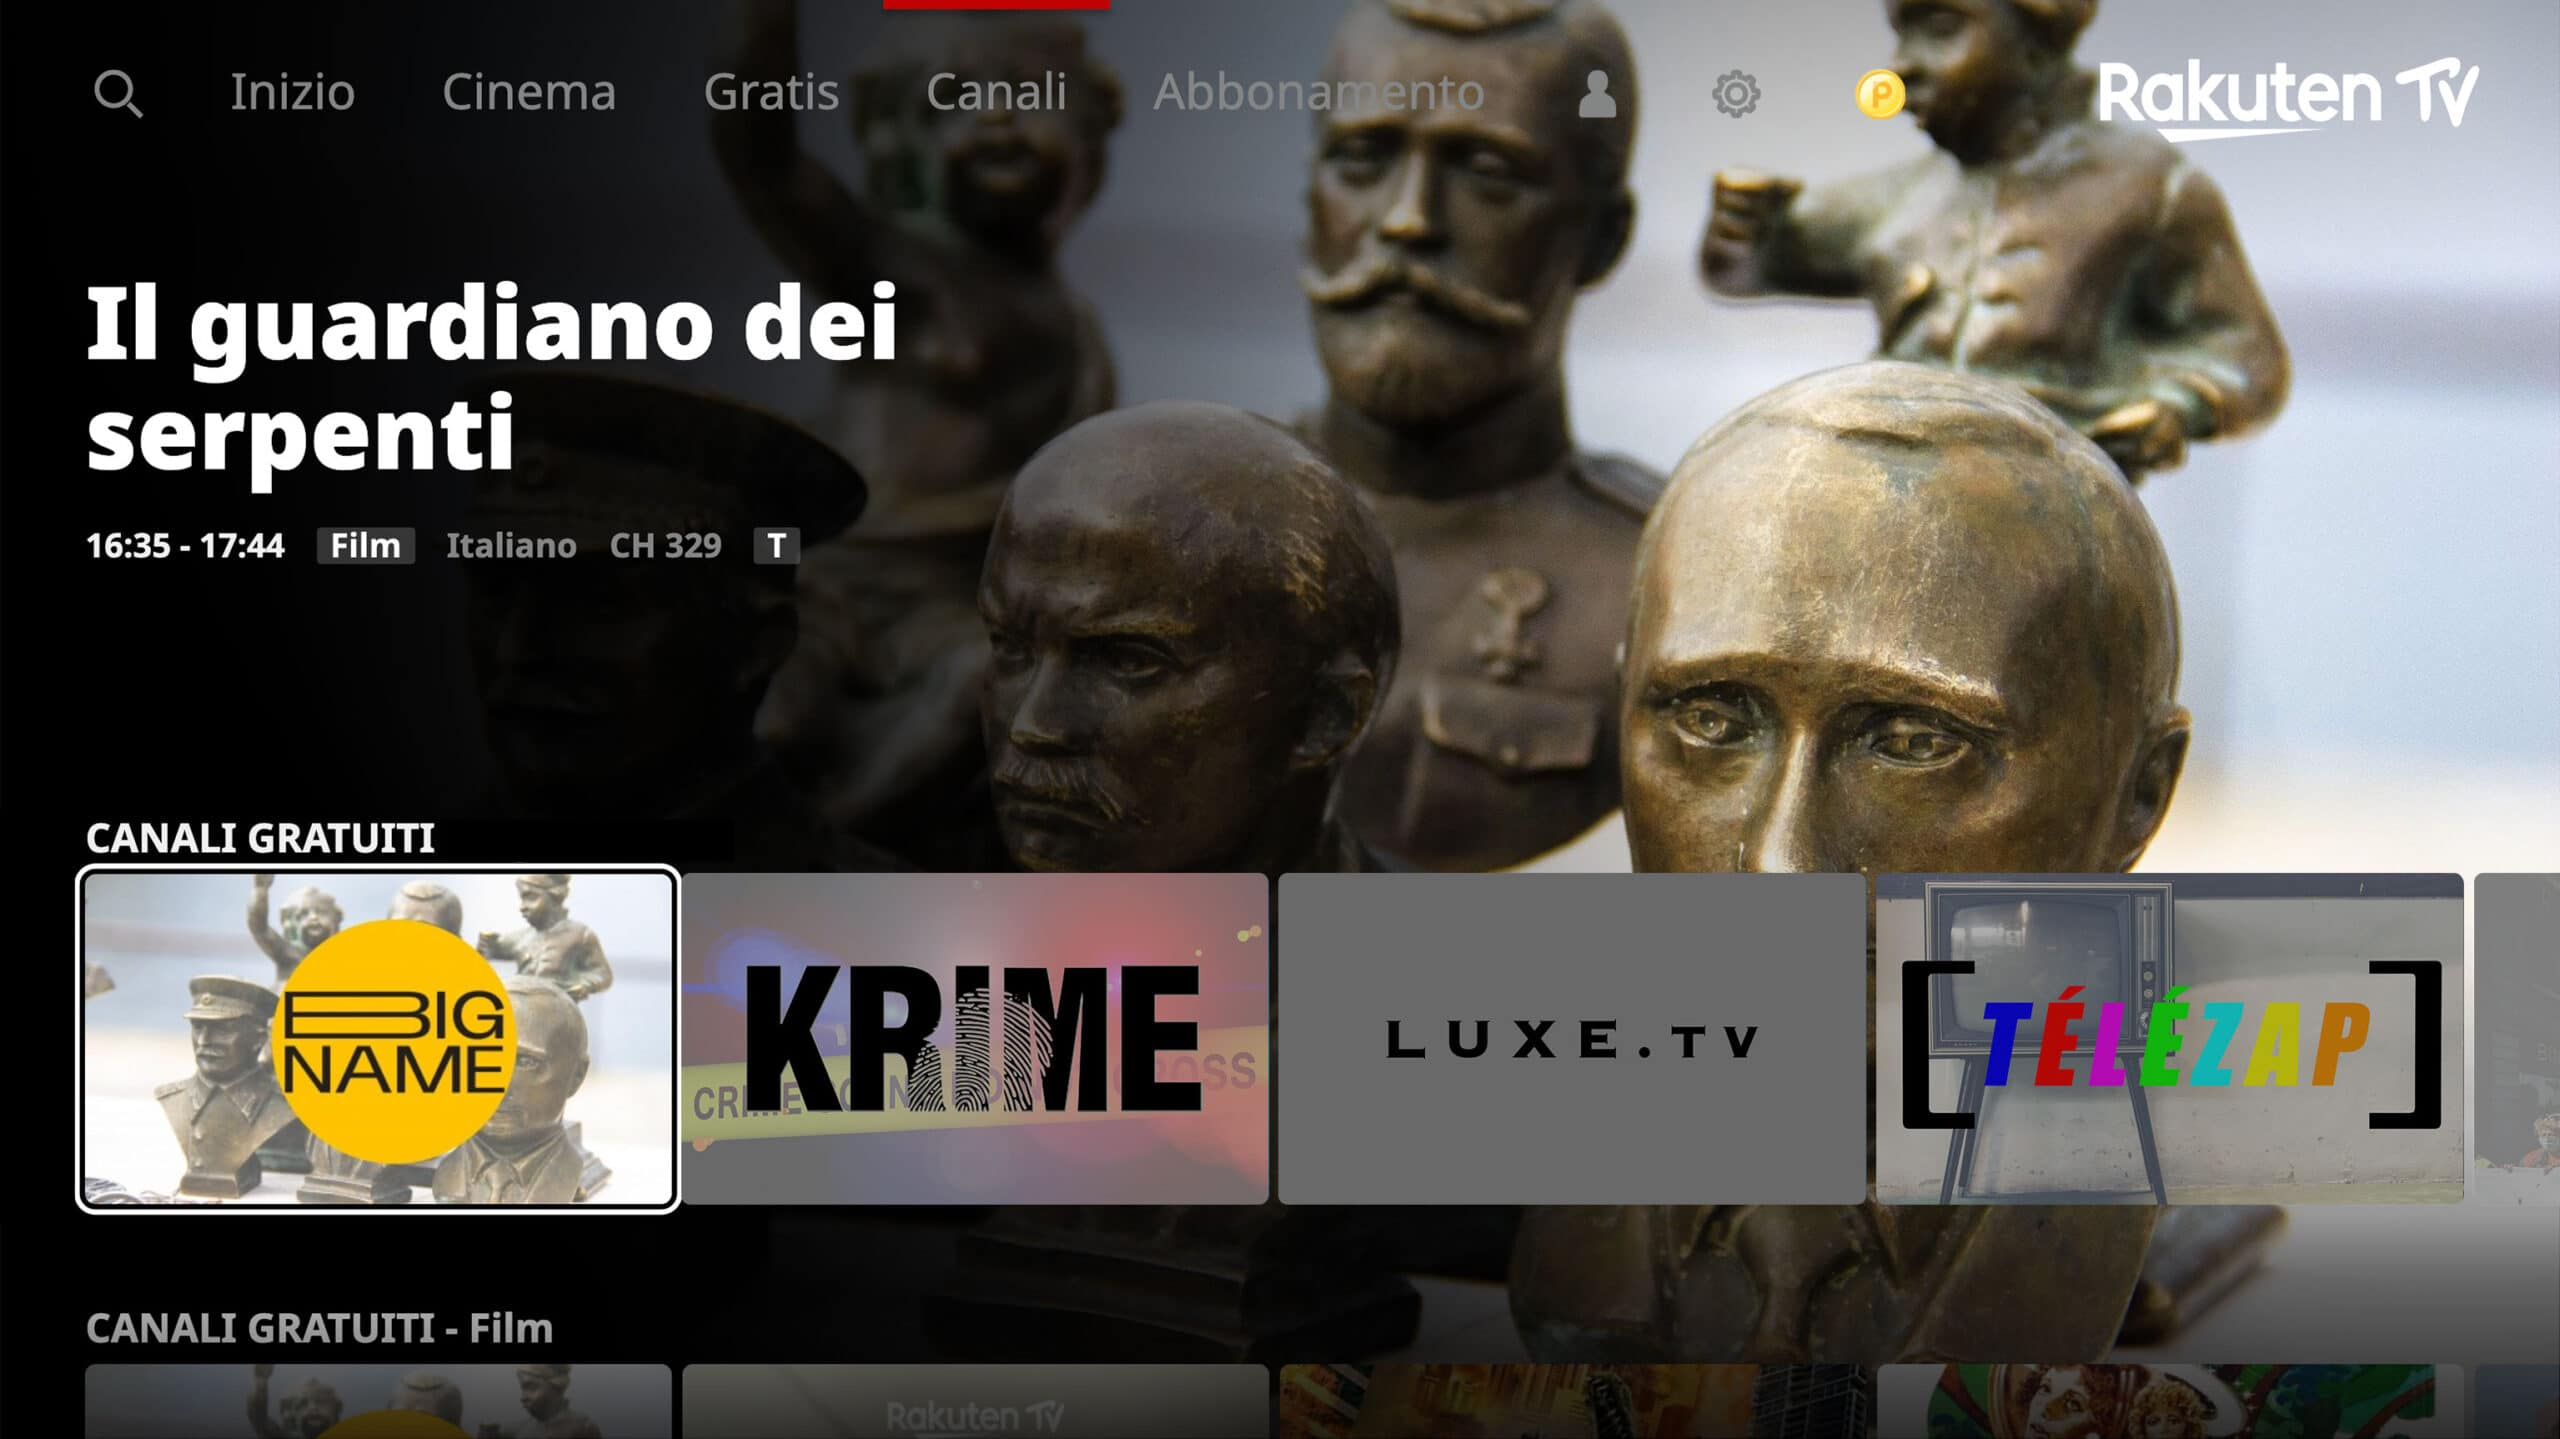 Partnership tra Rakuten TV e Alchimie: nuovi canali in chiaro in tutta Europa thumbnail